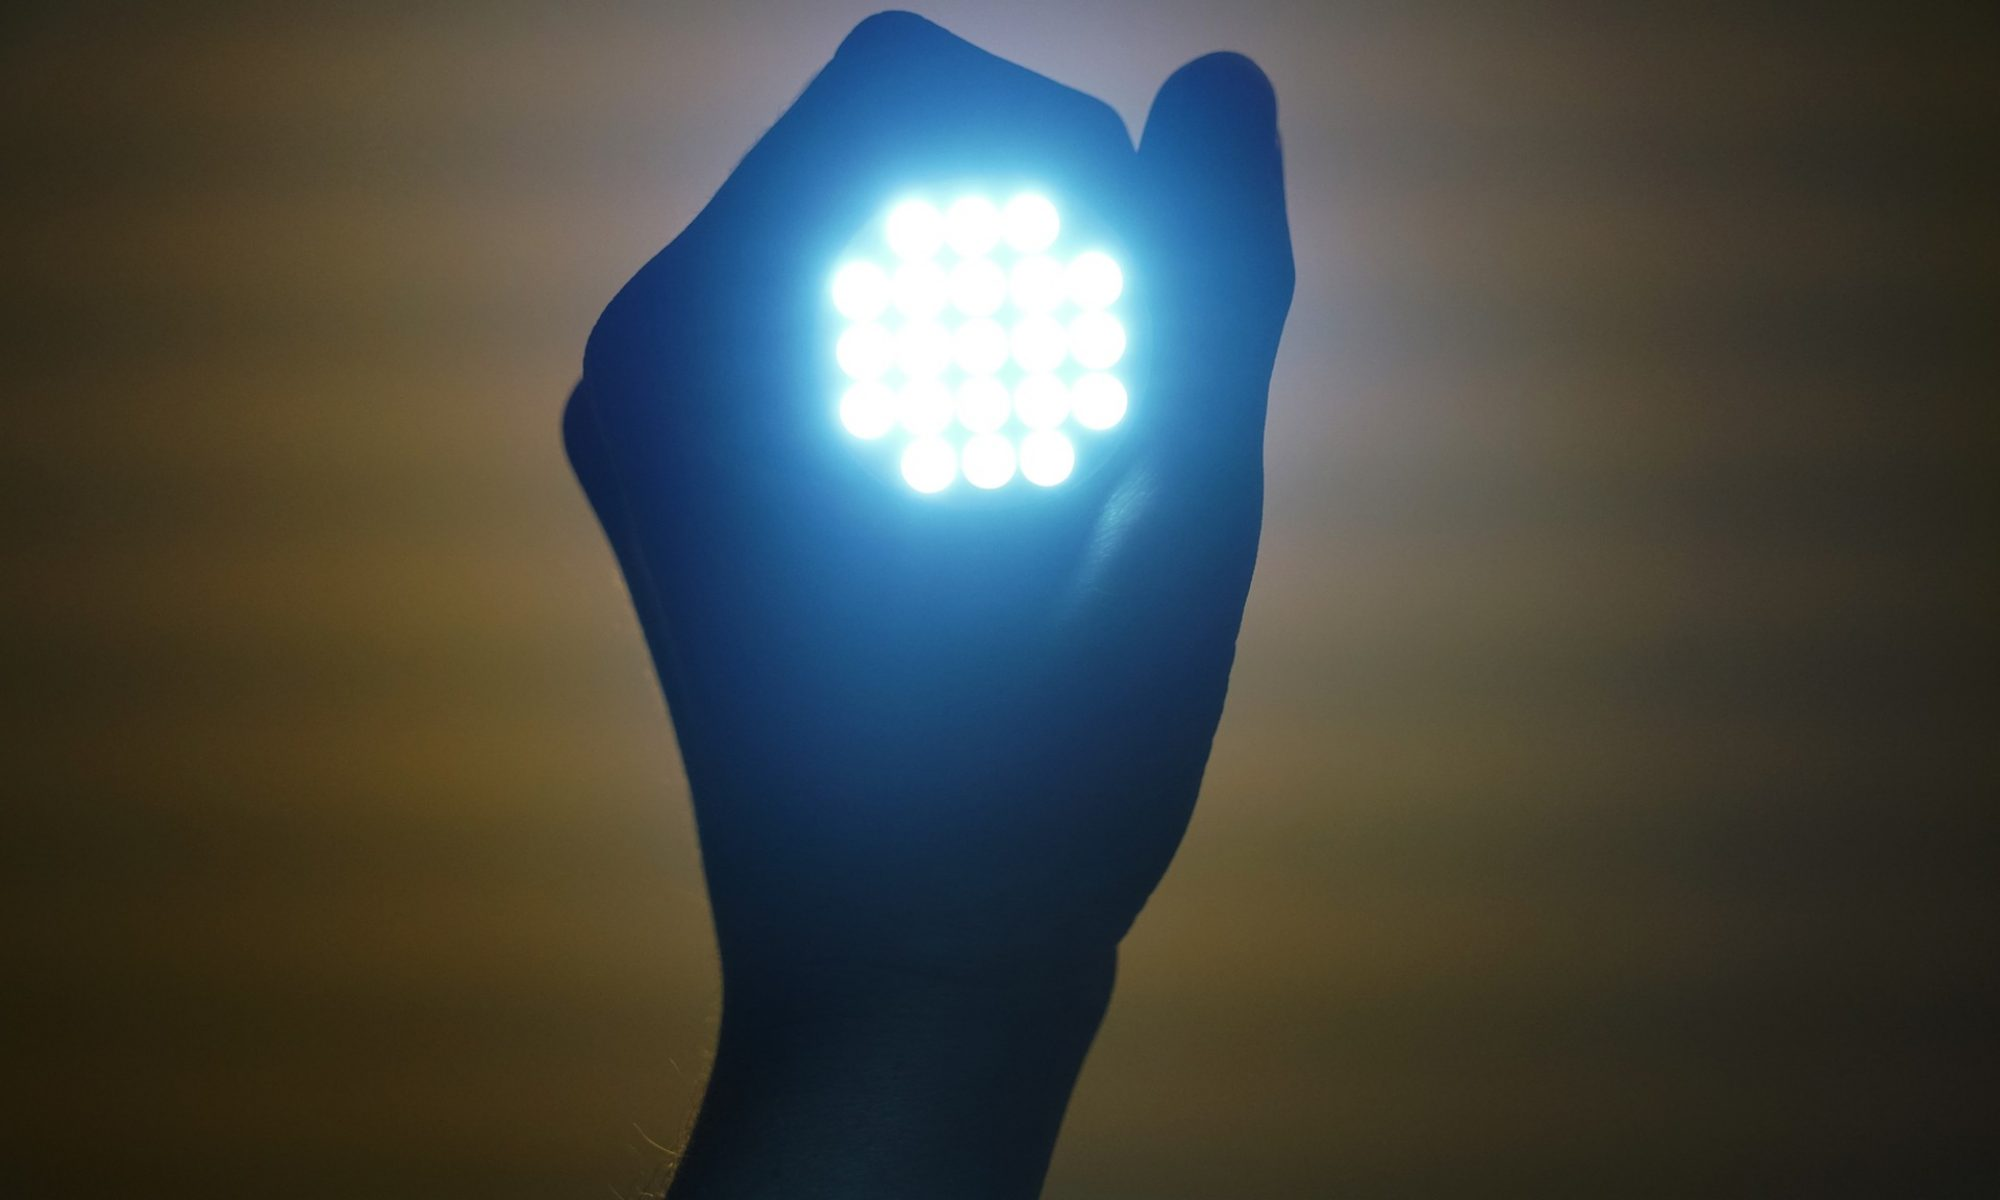 Taktikai lámpa